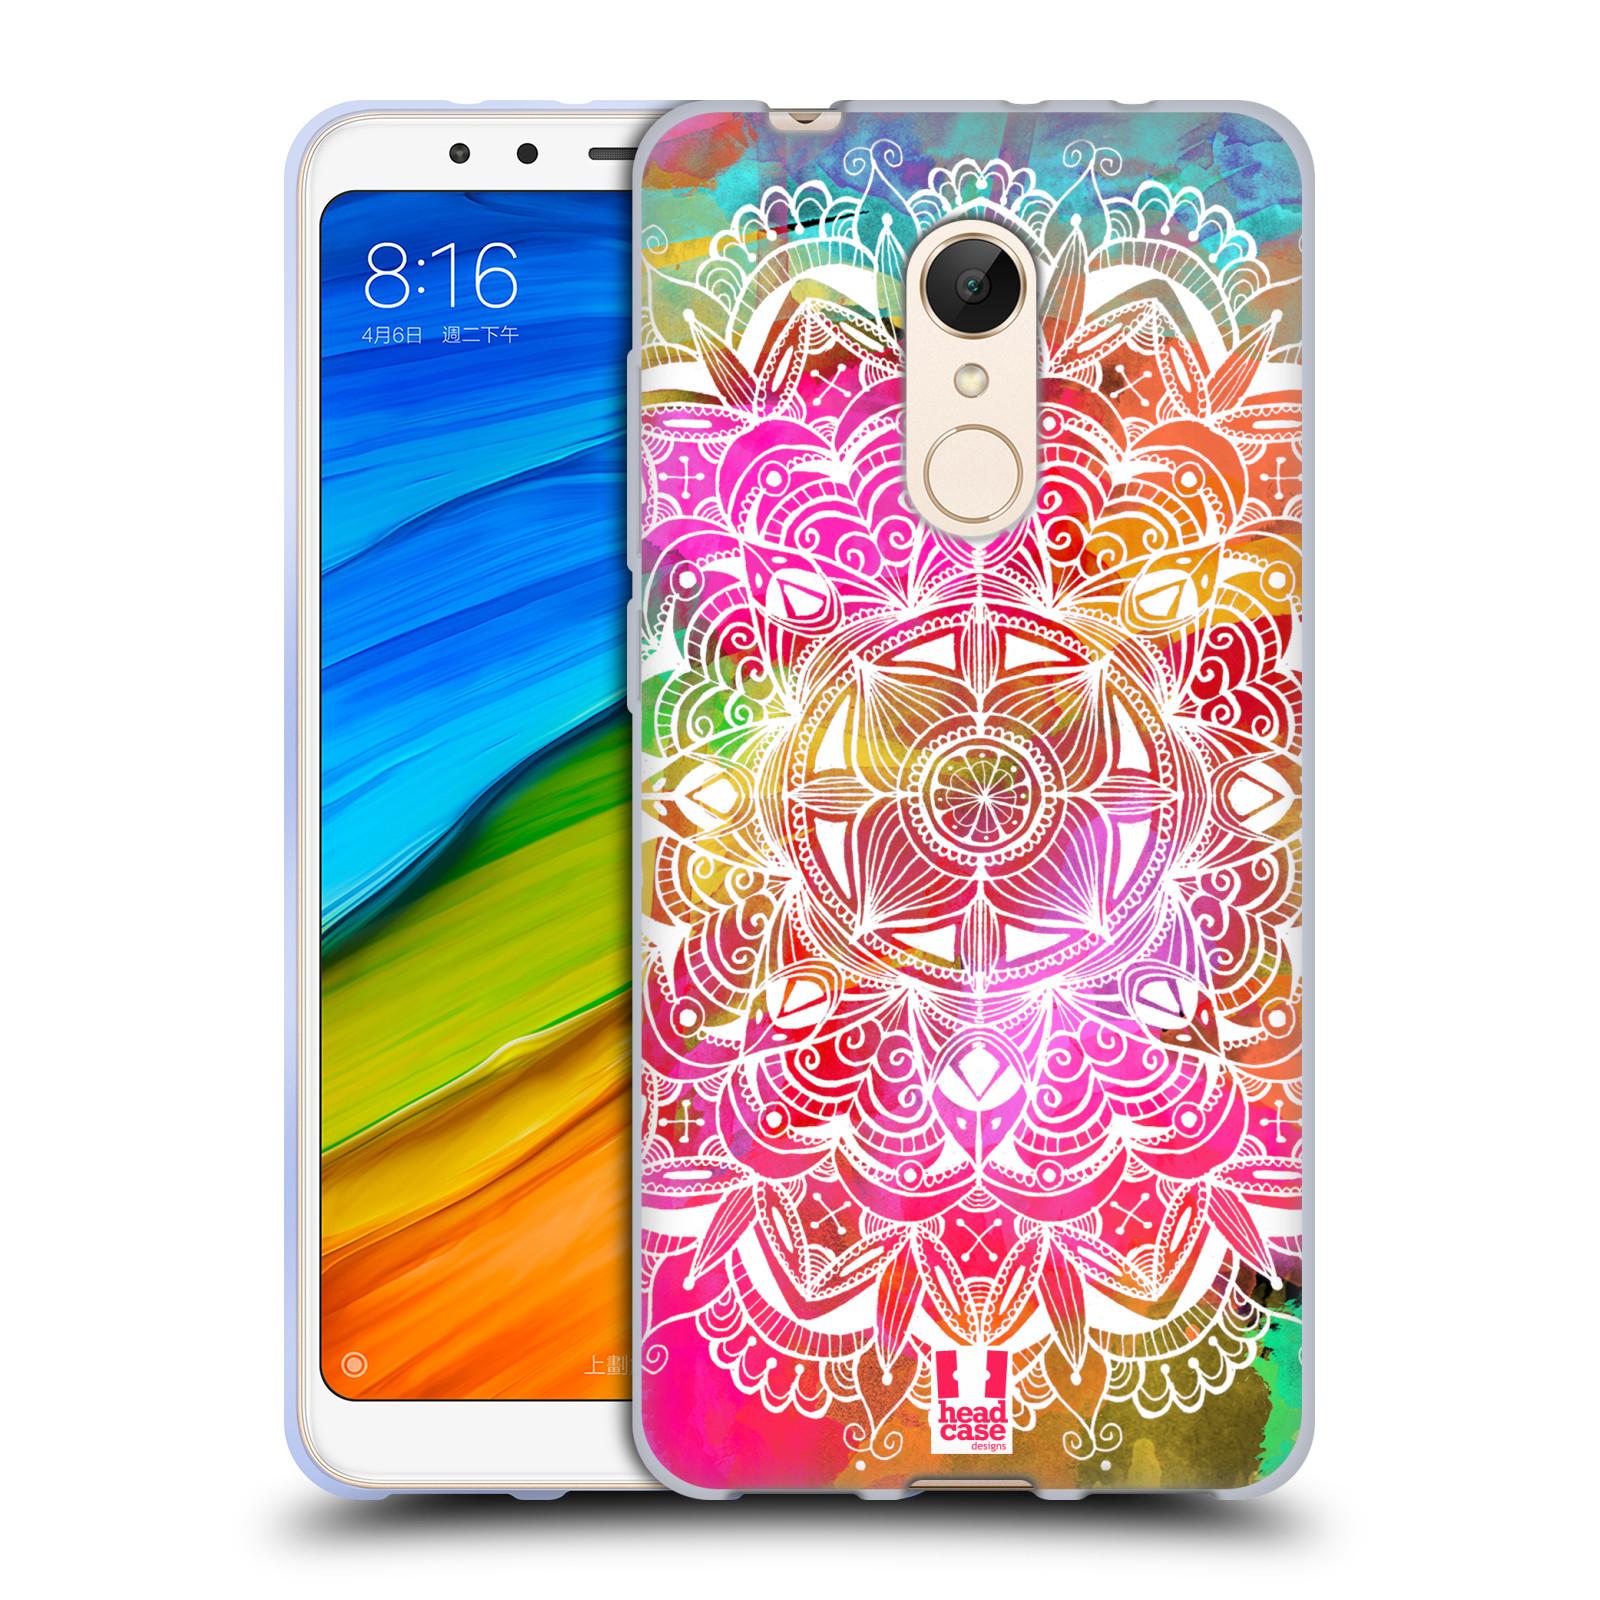 Silikonové pouzdro na mobil Xiaomi Redmi 5 - Head Case - Mandala Doodle Watercolour